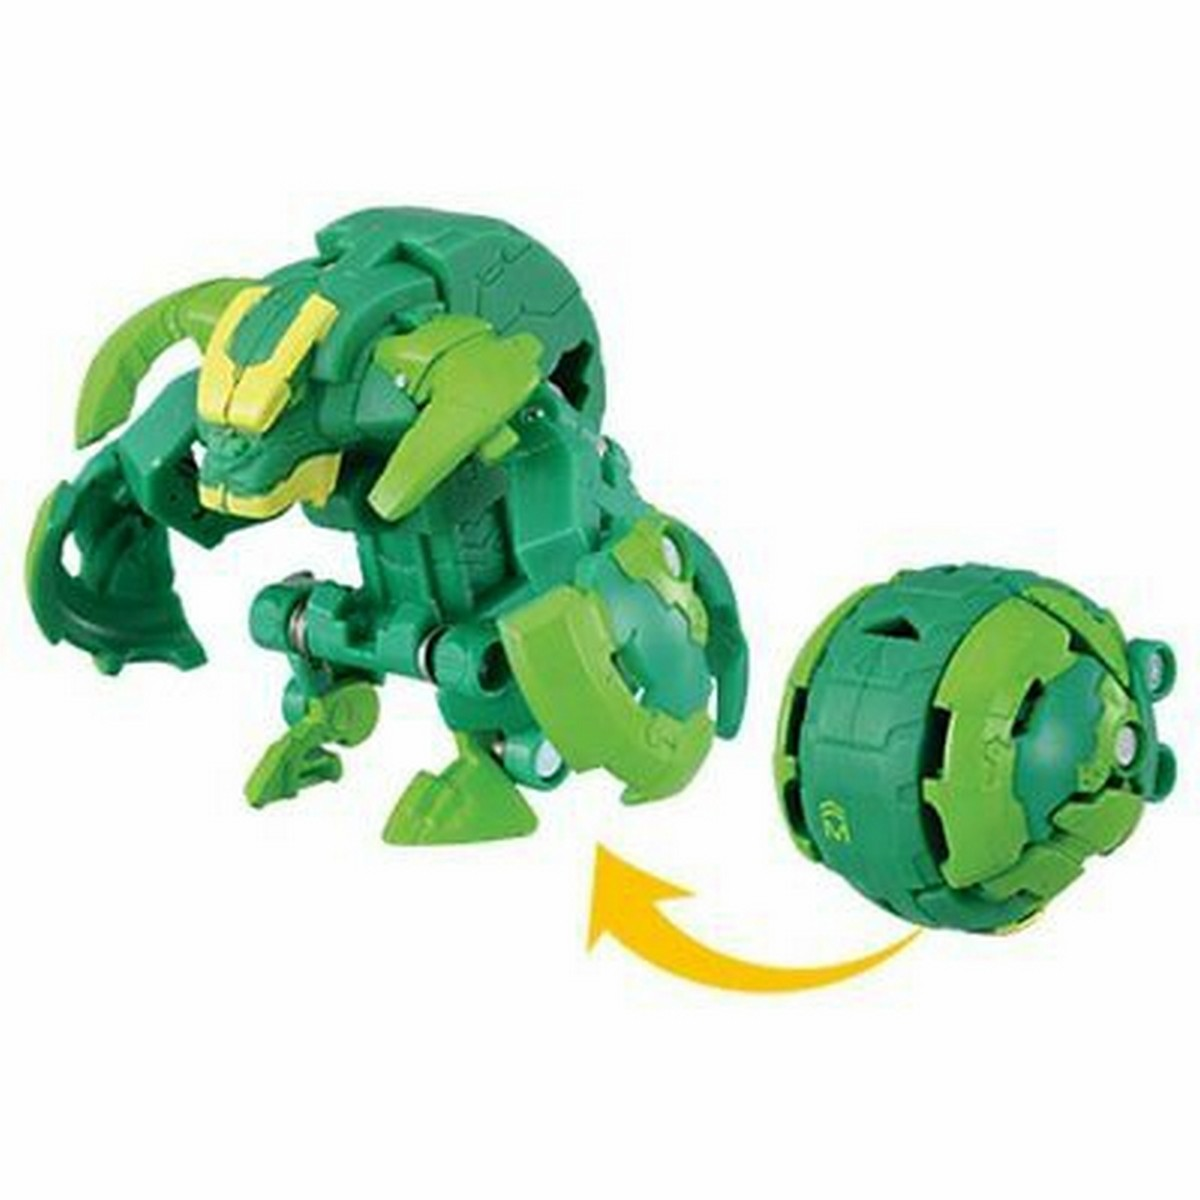 Bakugan Deformation Ball Battle Planet Figure